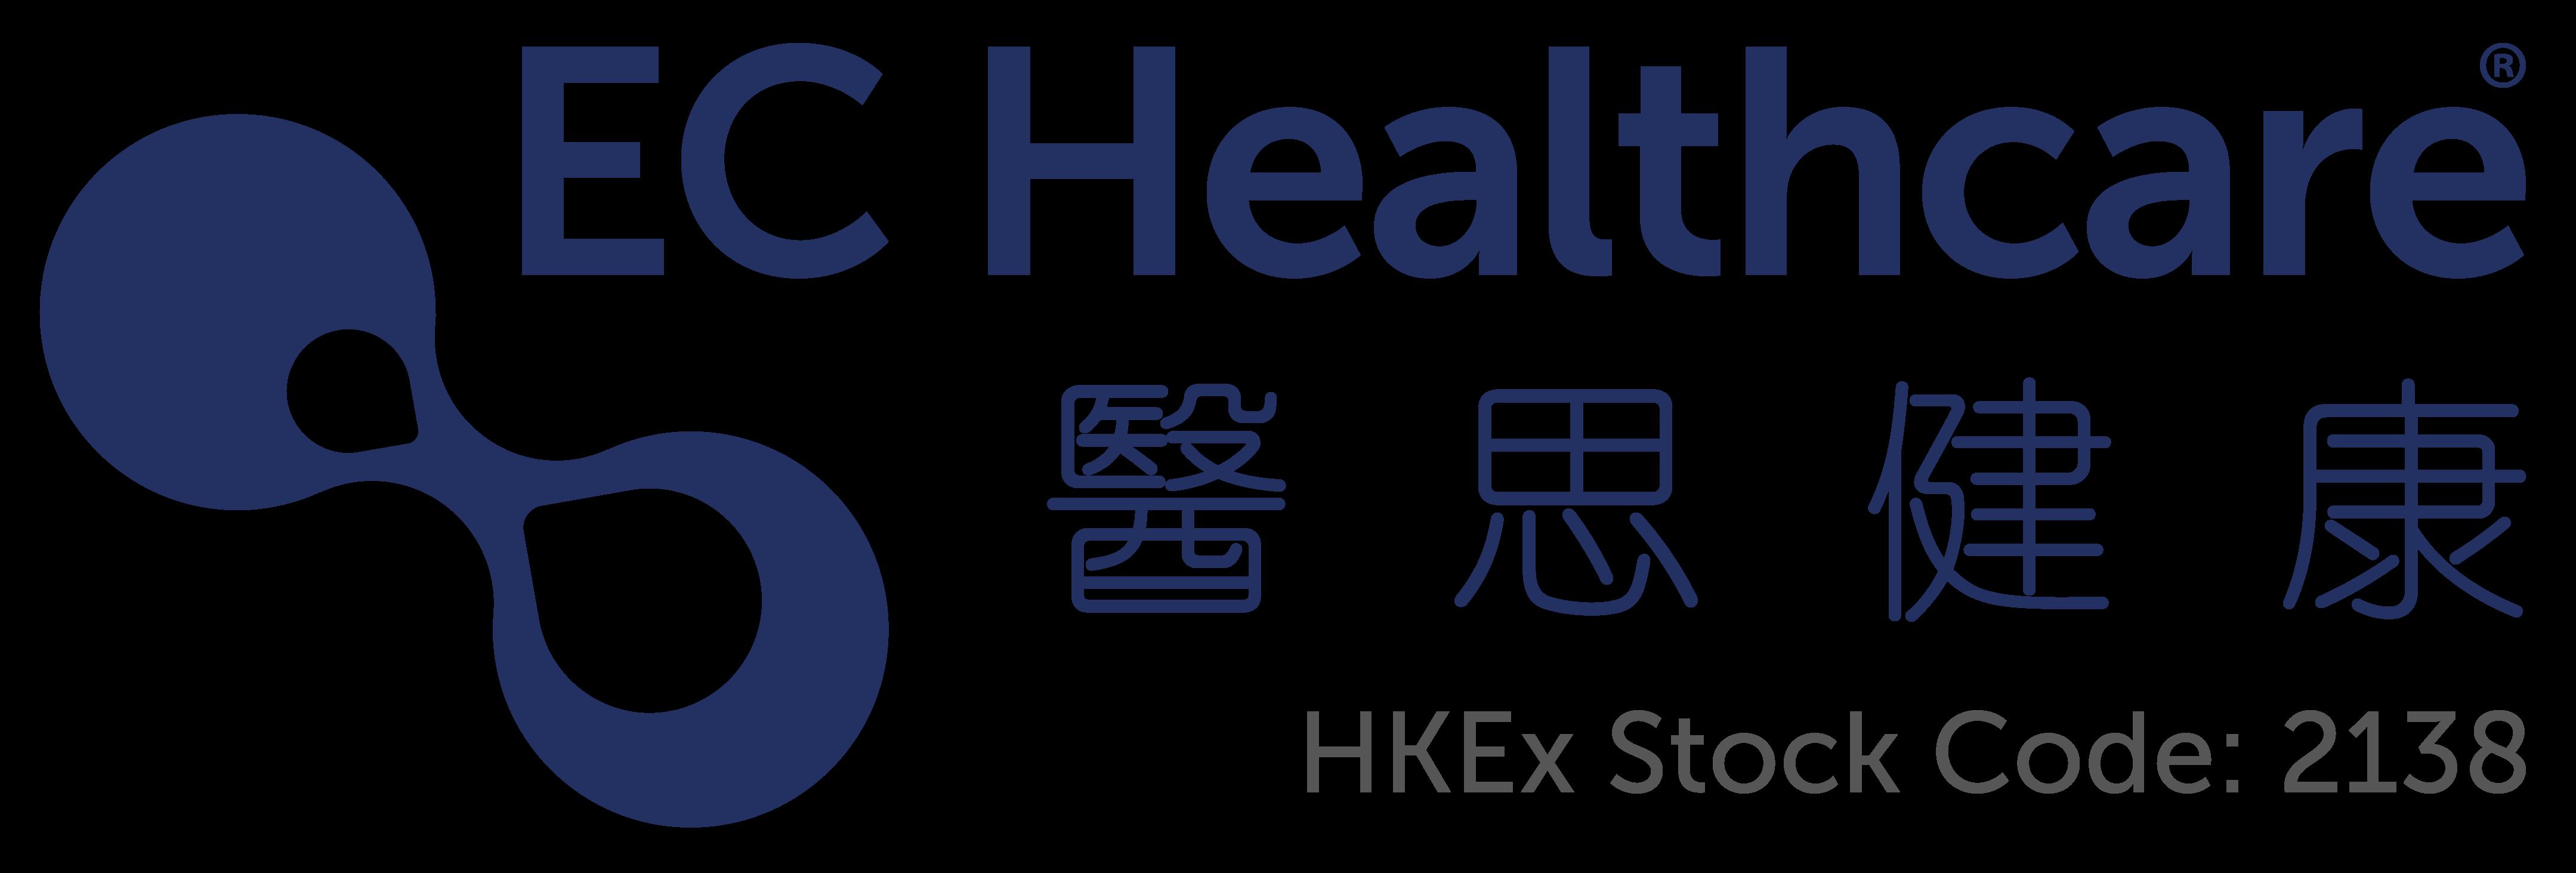 EC Healthcare丨網上商店